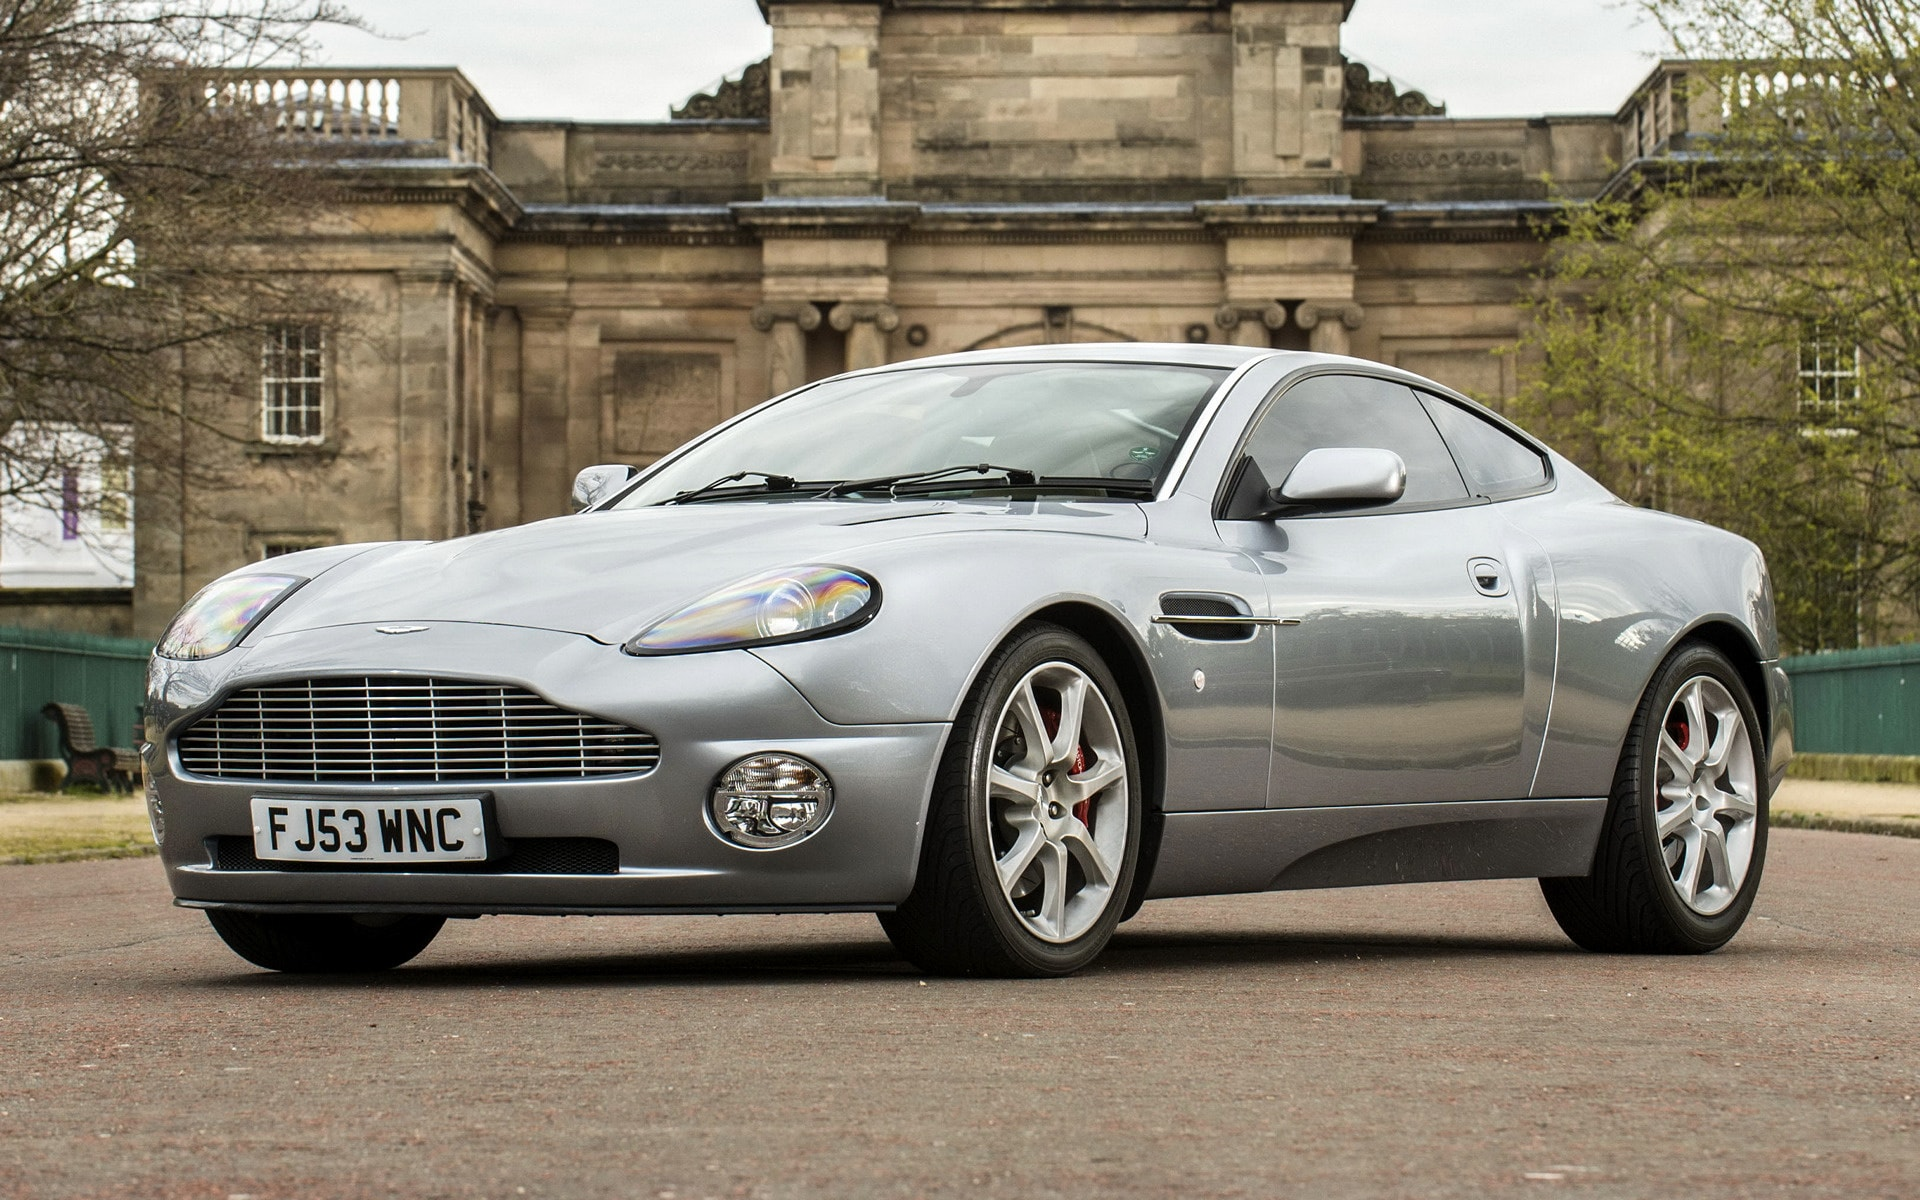 2001 Aston Martin Vanquish Widescreen